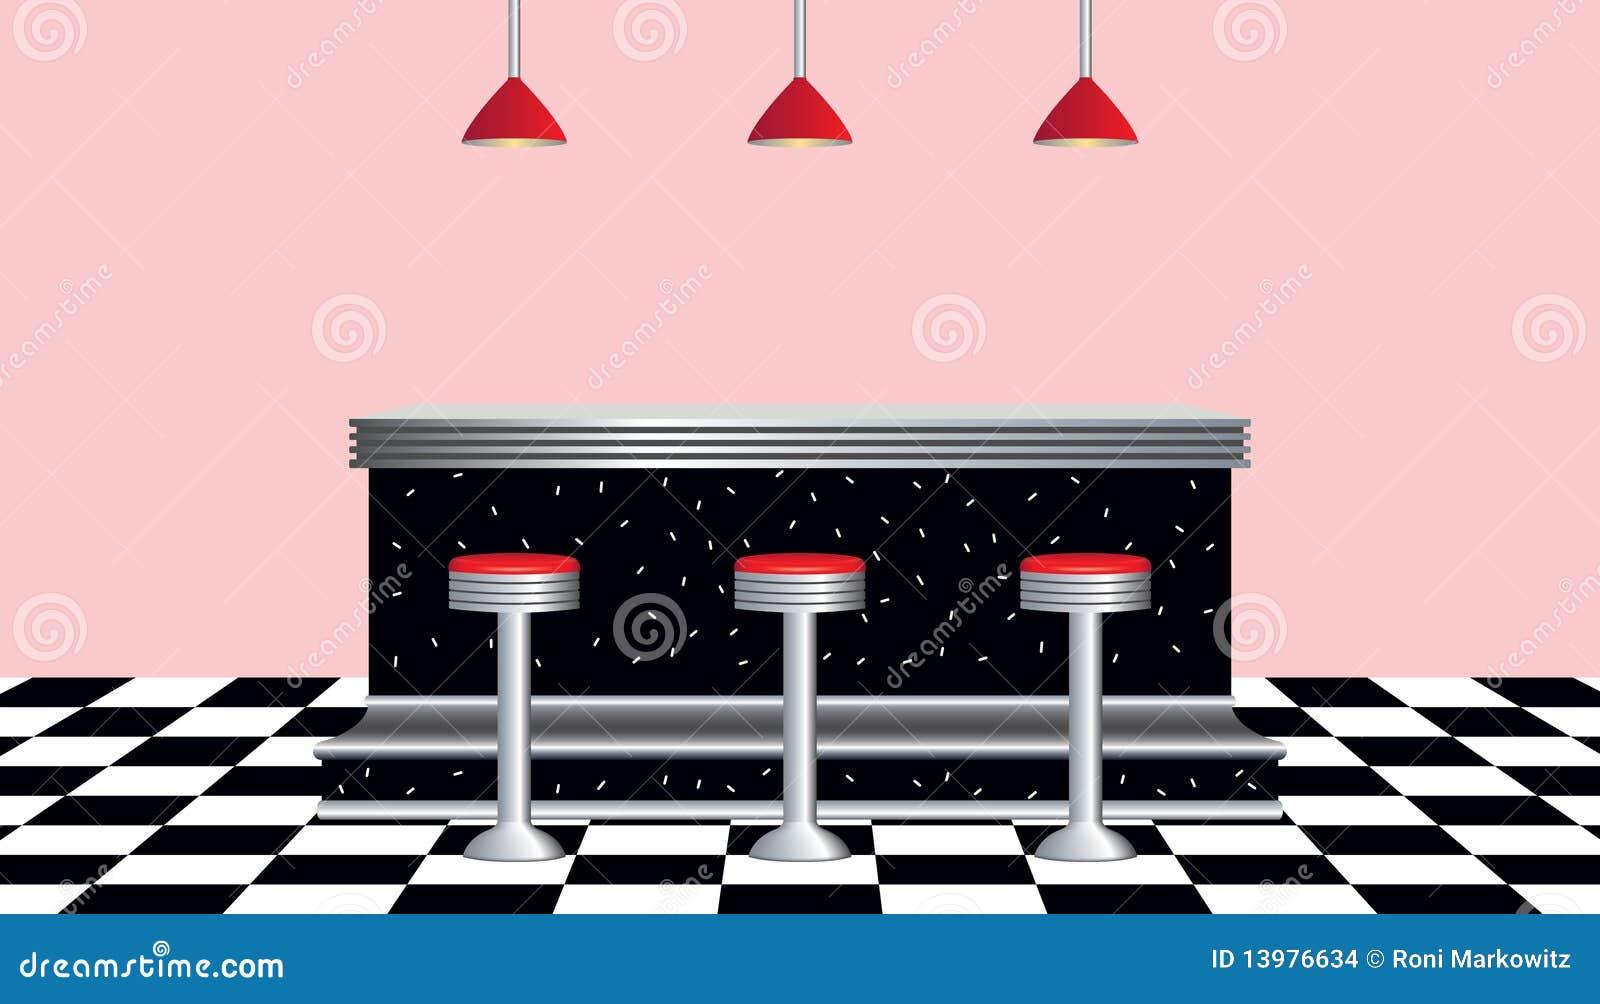 Retro Diner 1950s Style Stock Vector Image Of Retro